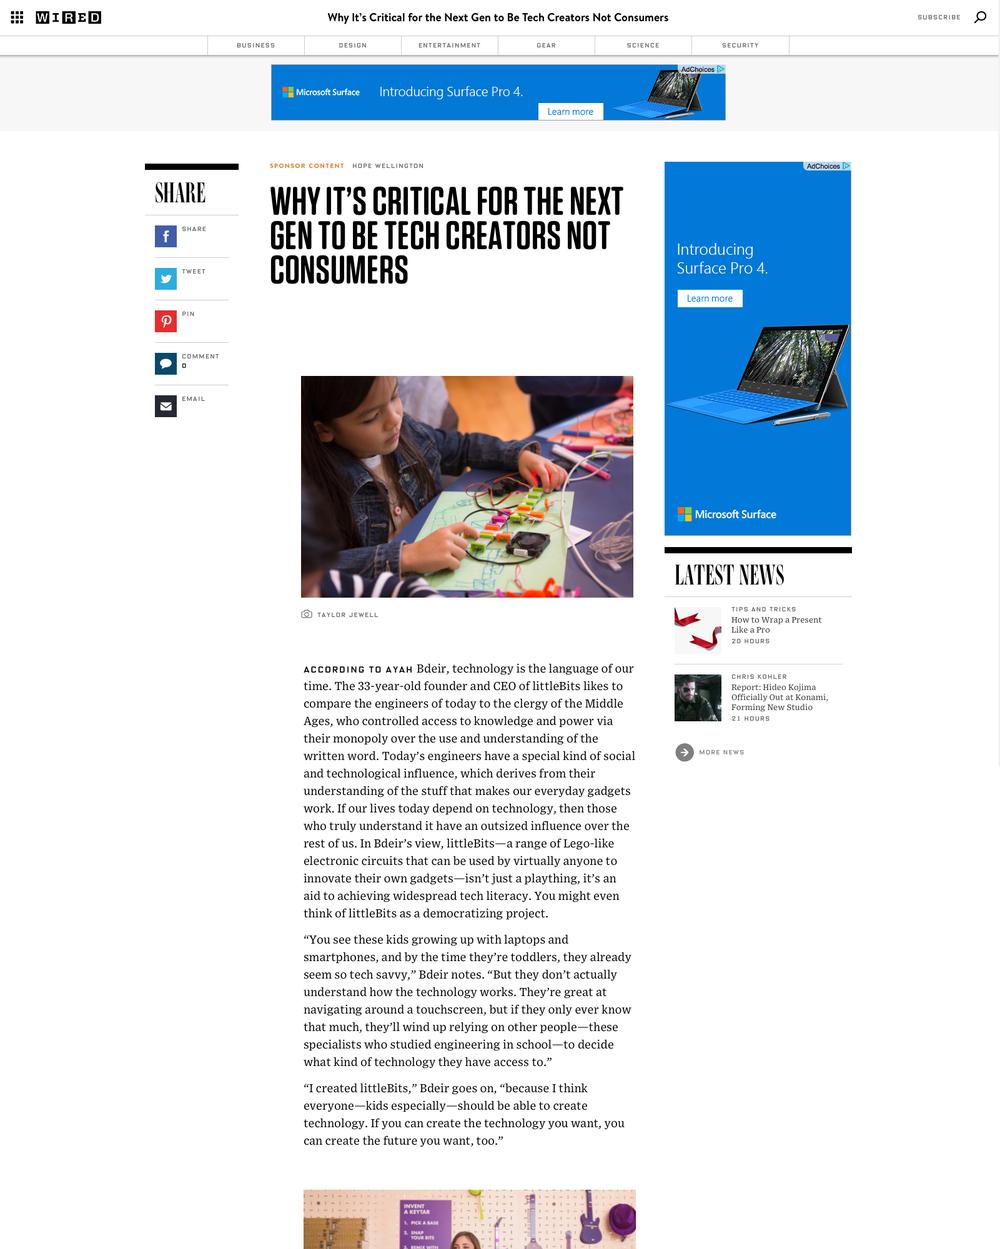 Microsoft_Article01_AyahBdeir.jpg